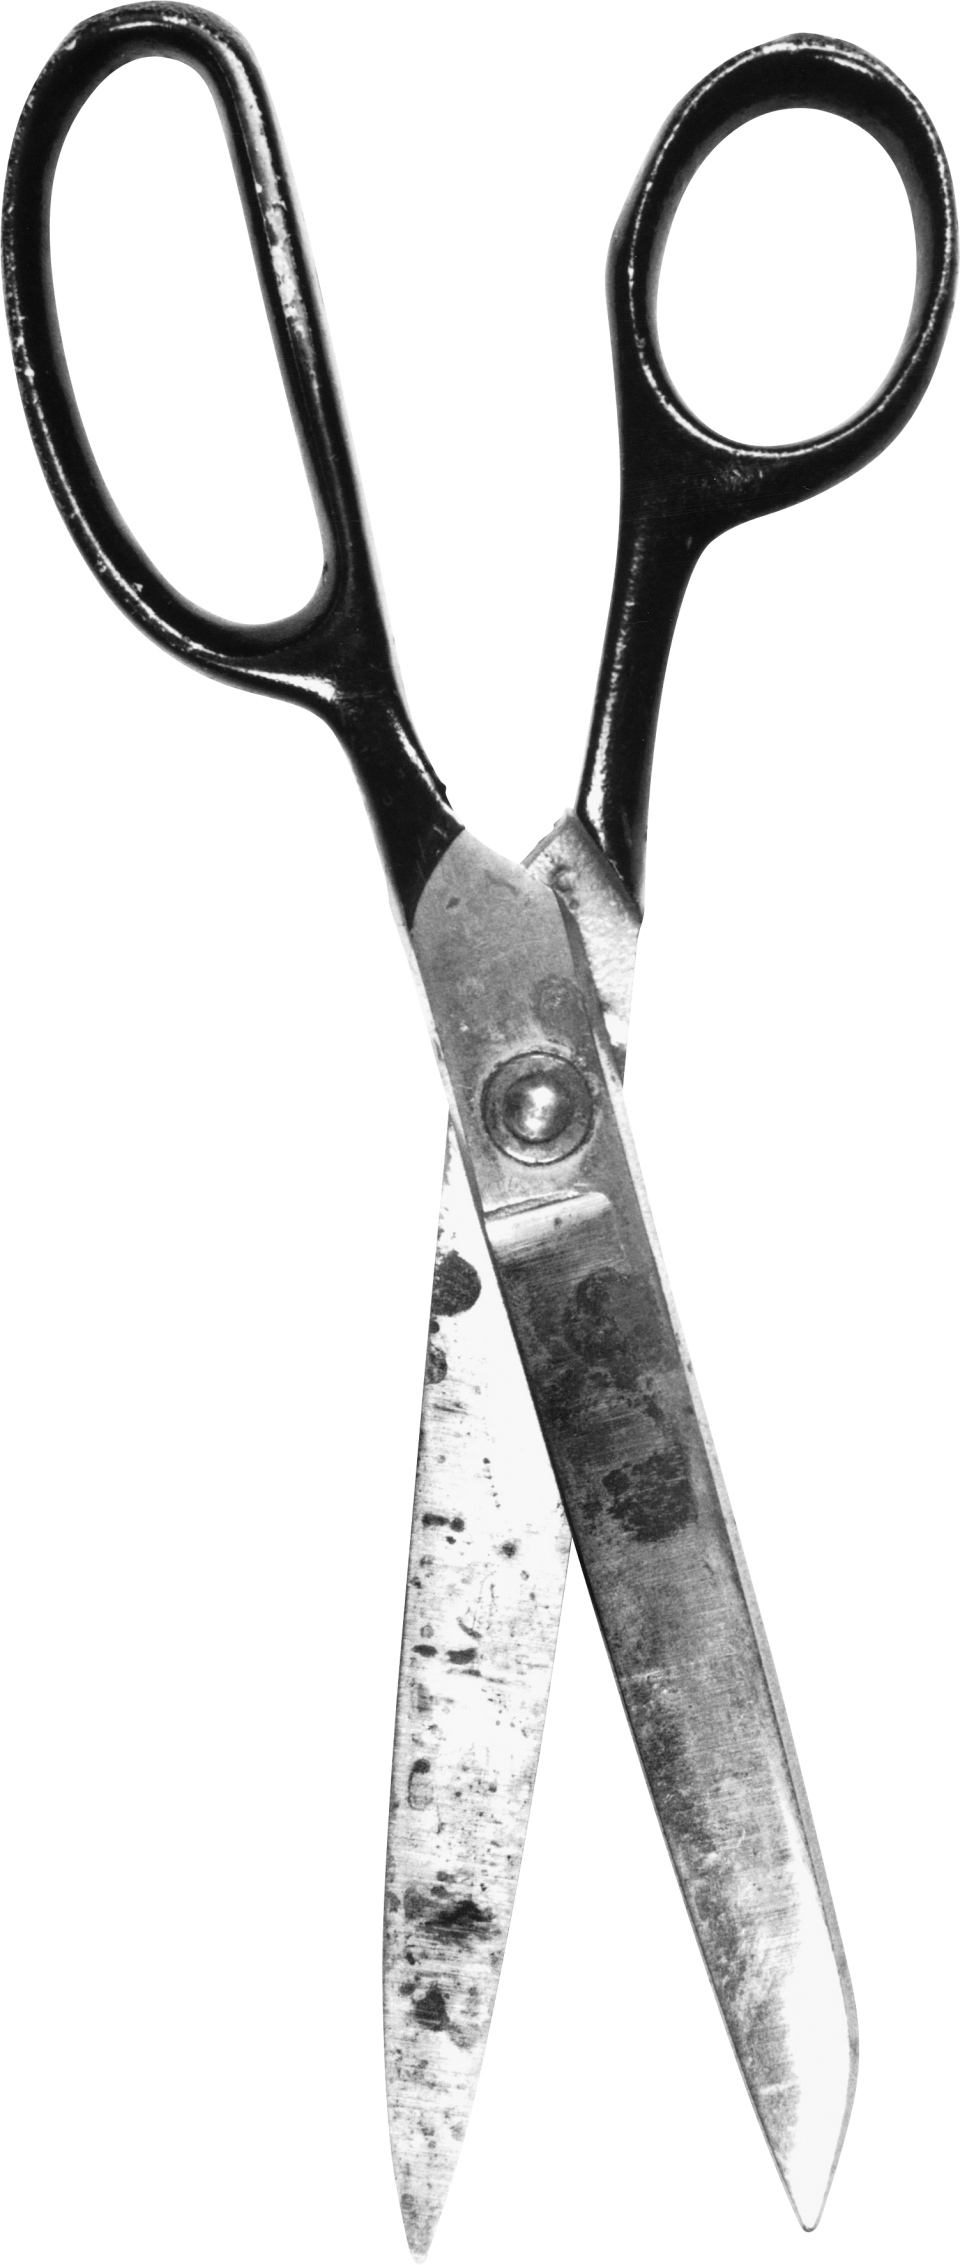 Scissors PNG Image